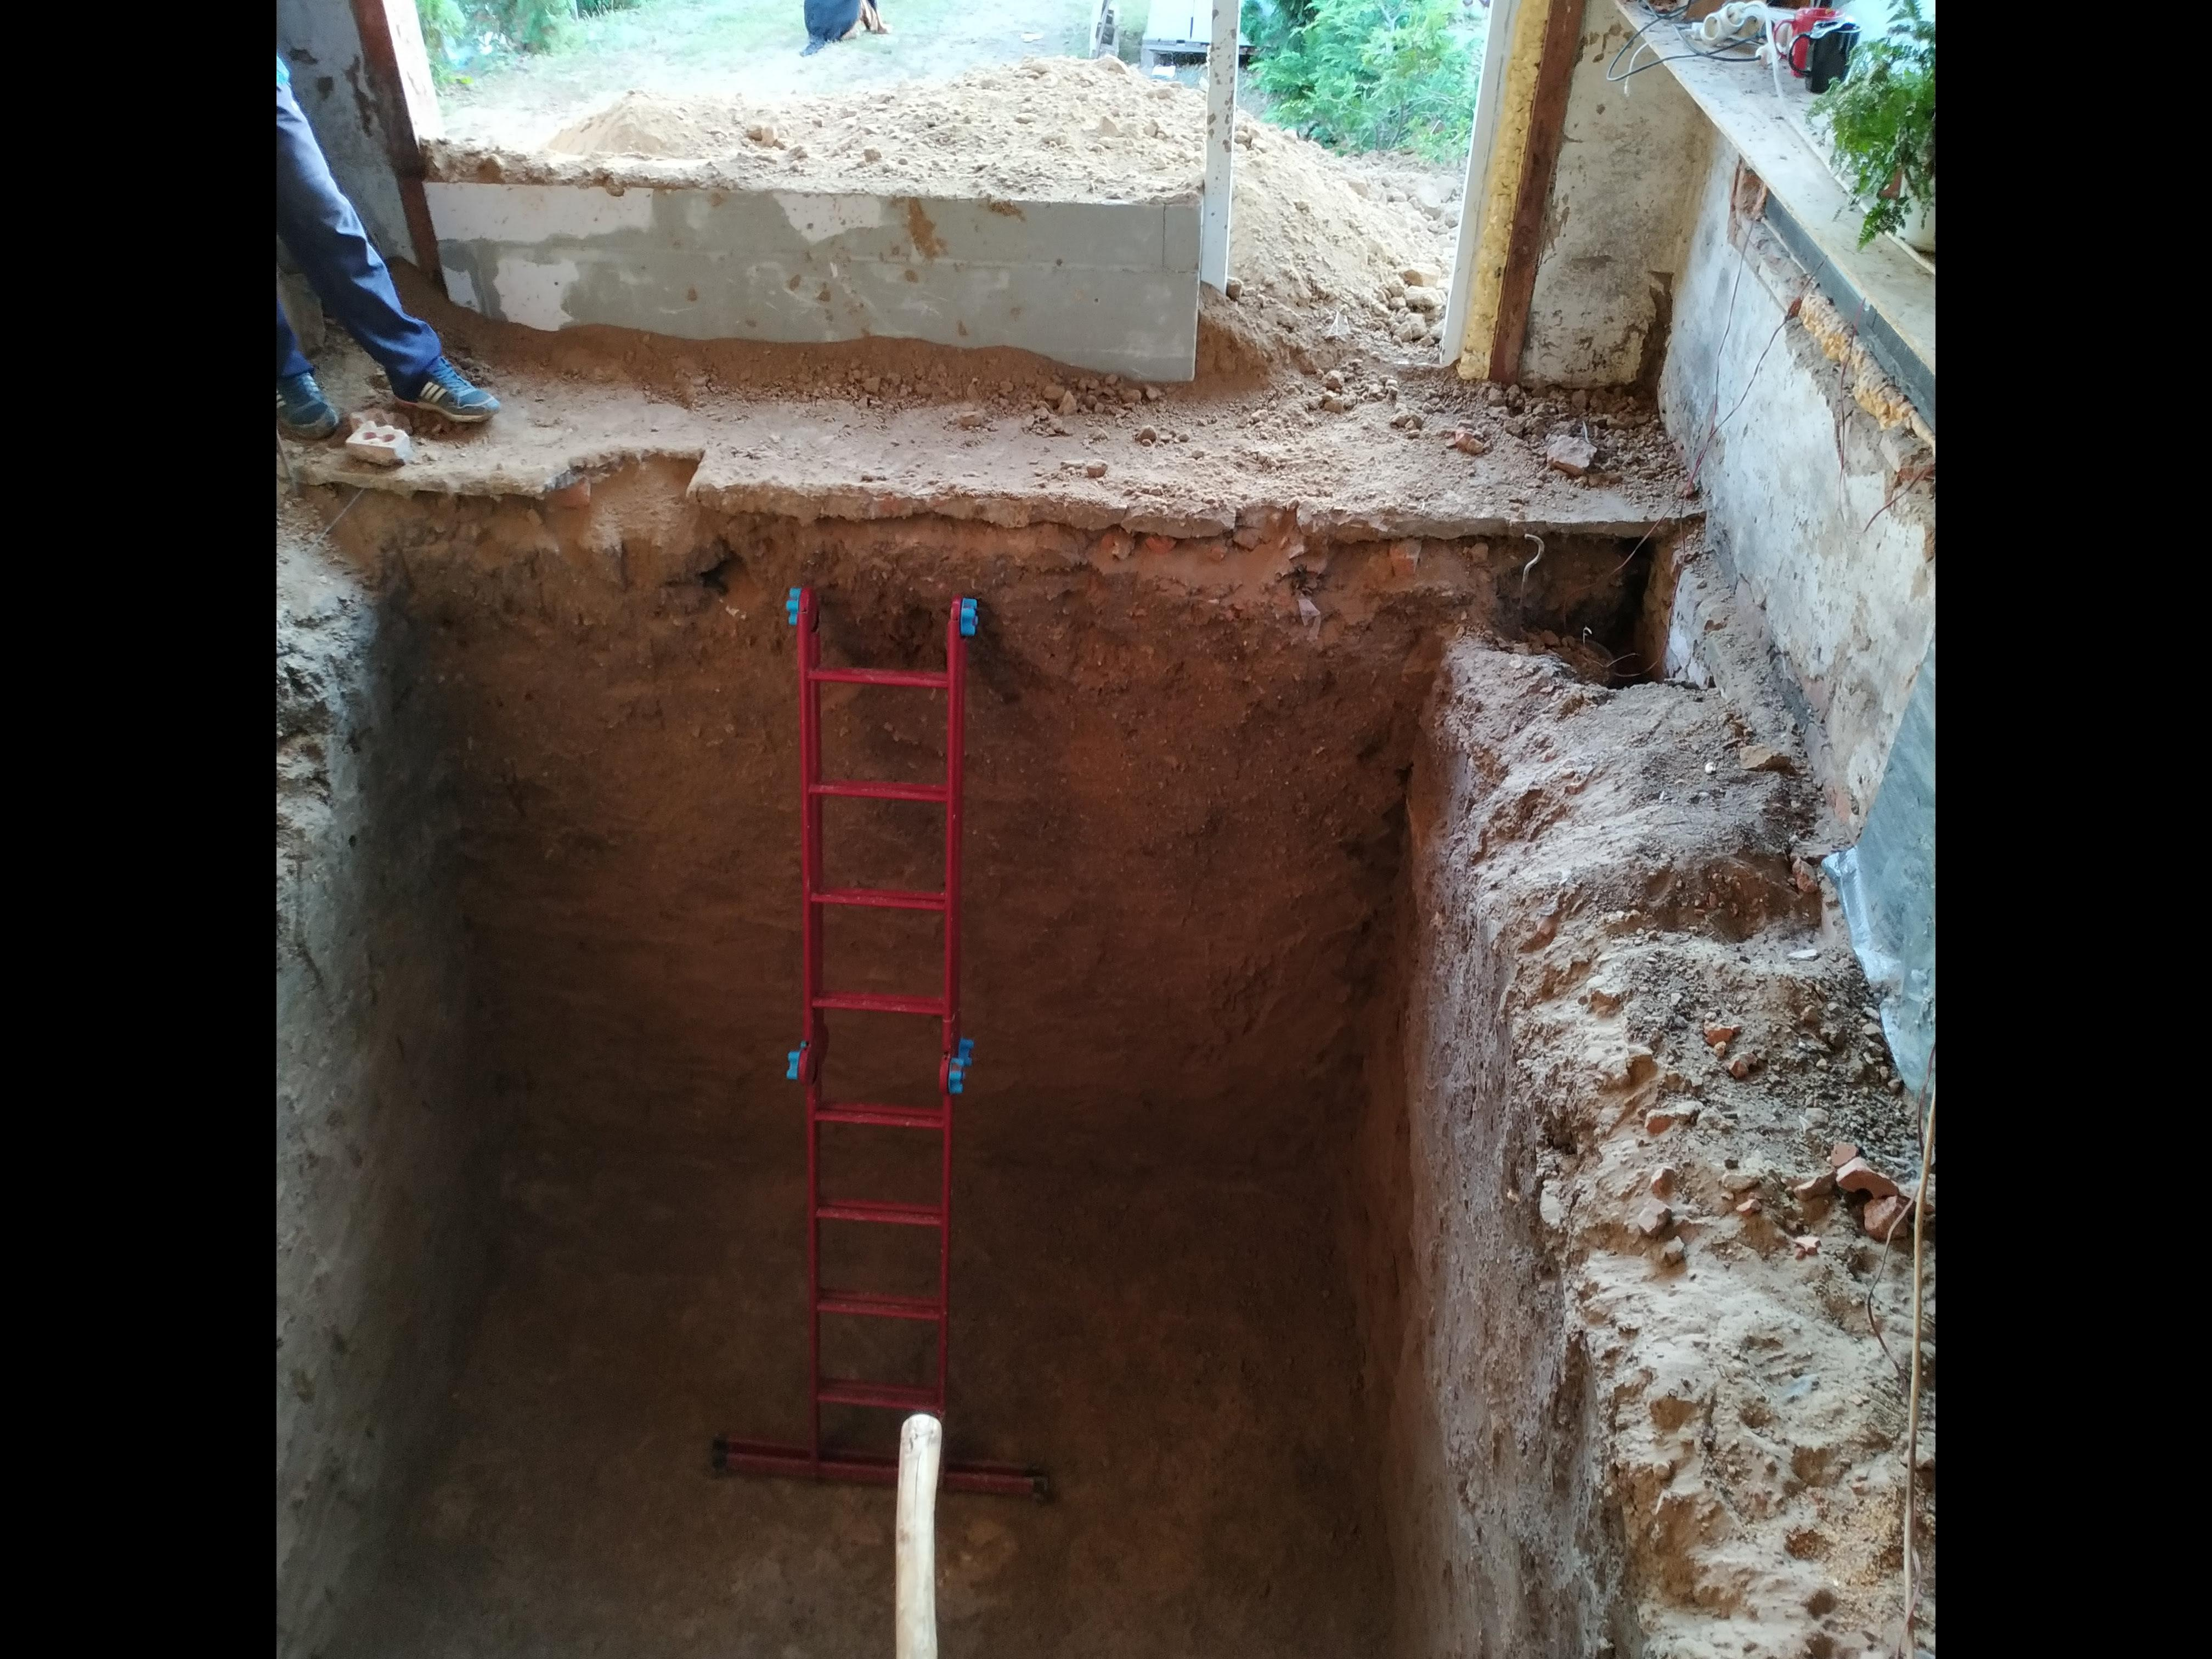 Фото Погреб на 15 м3, в гараже, глубина 2,5 м. Выполнен за 3 дня по жёсткой глине. Работал один.